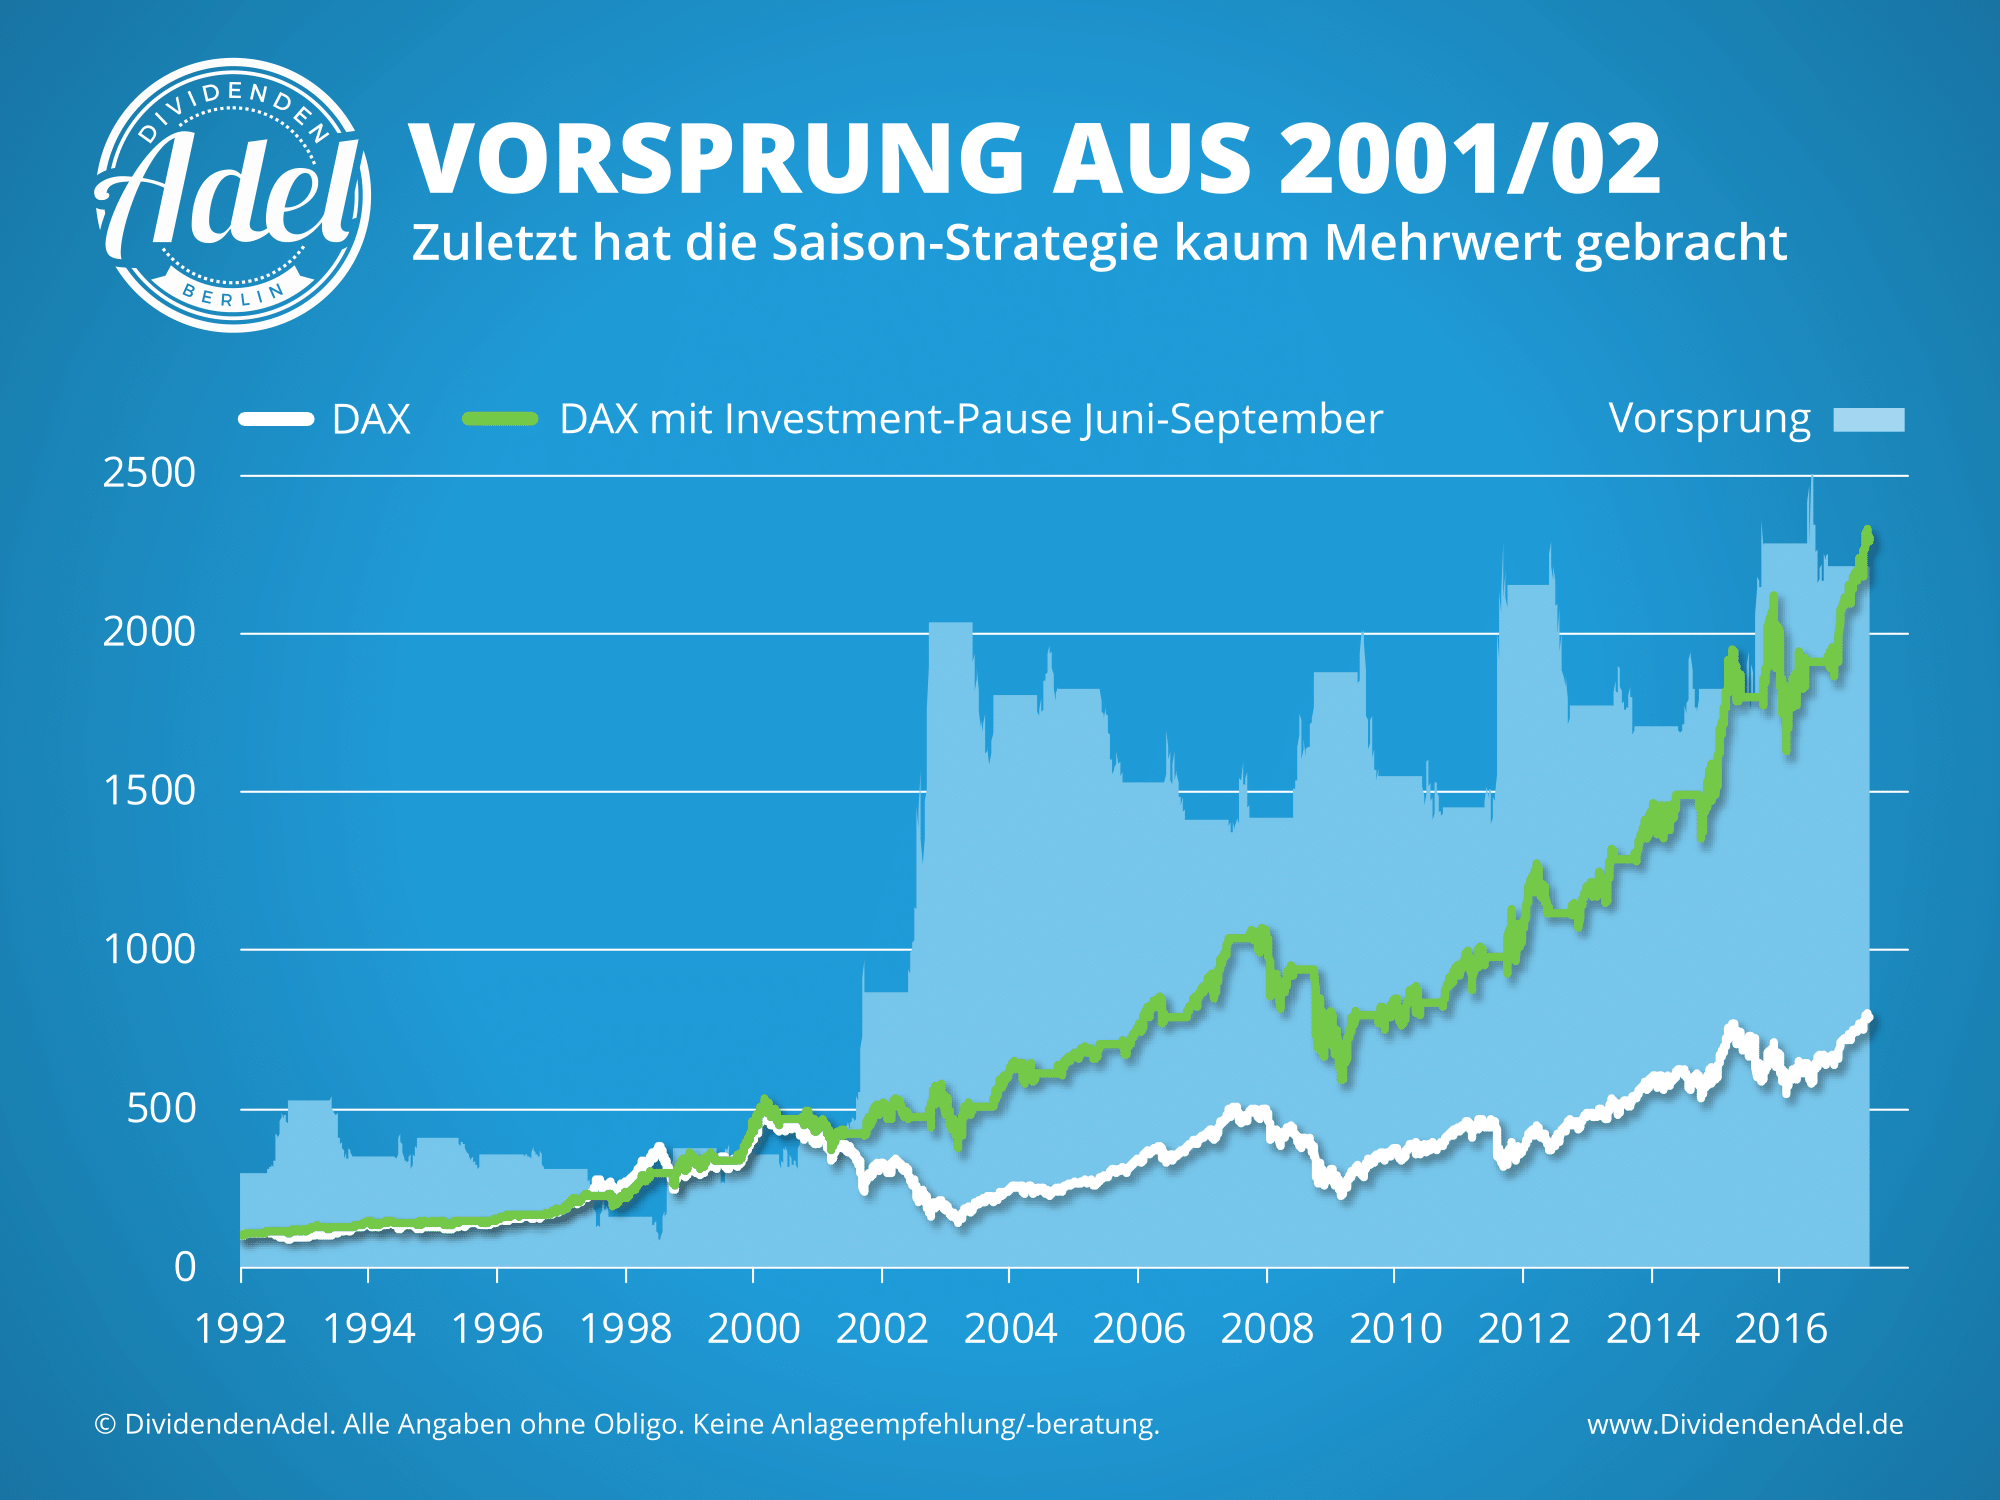 Saisonalität Sell in May DAX Historie